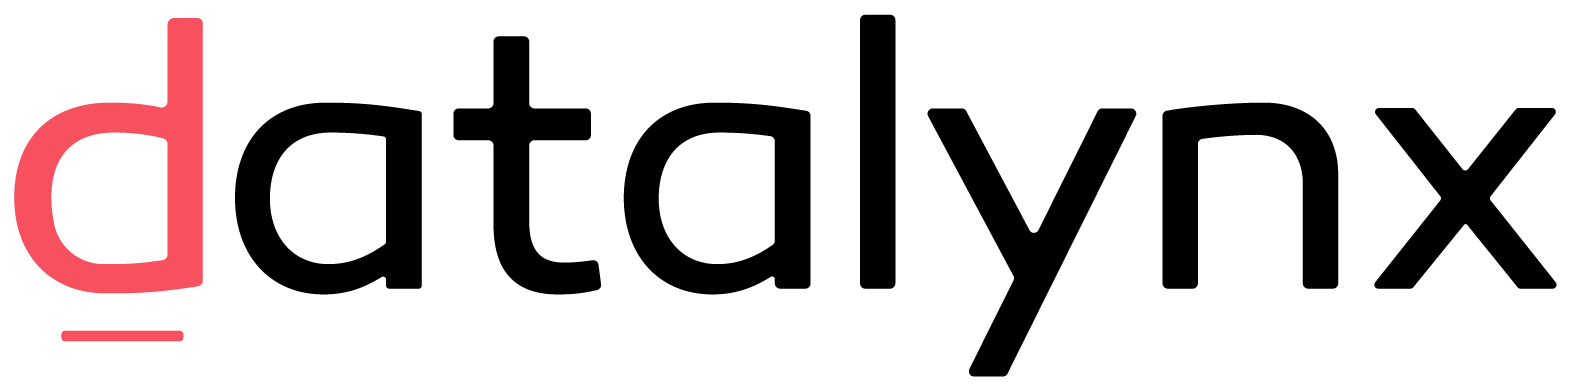 Datalynx